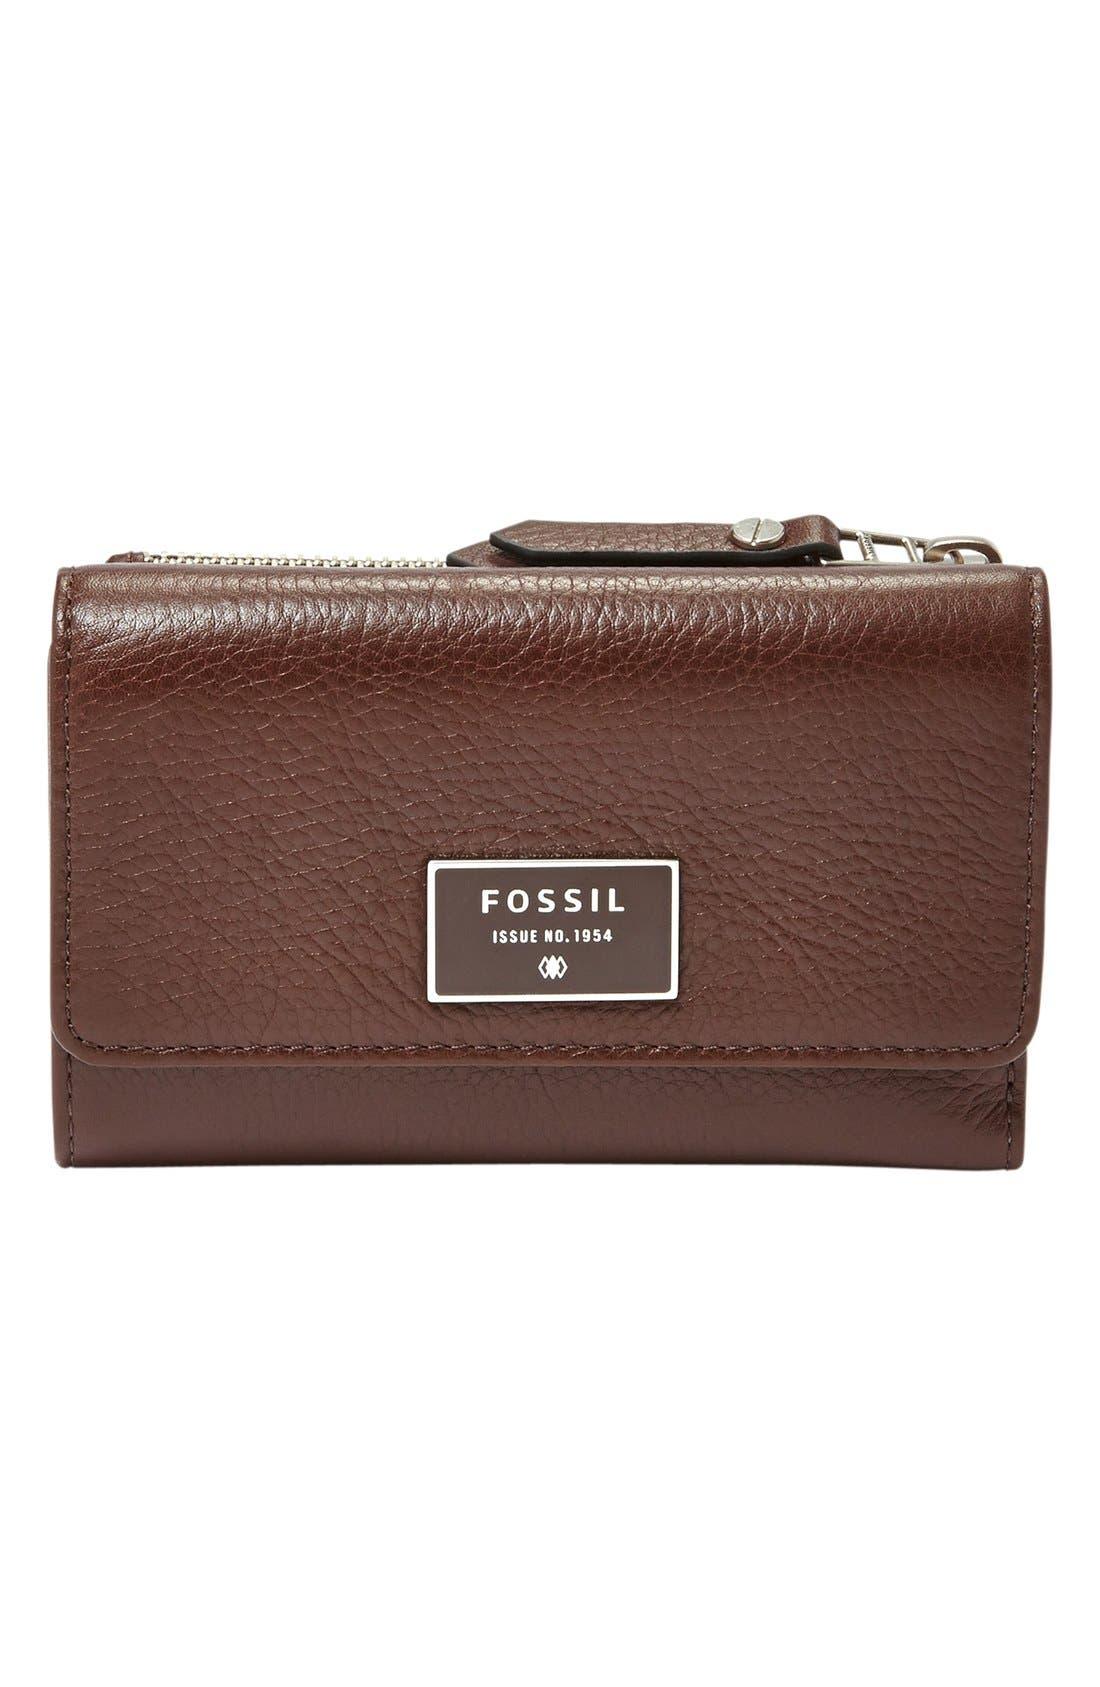 Main Image - Fossil 'Dawson' Flap Wallet